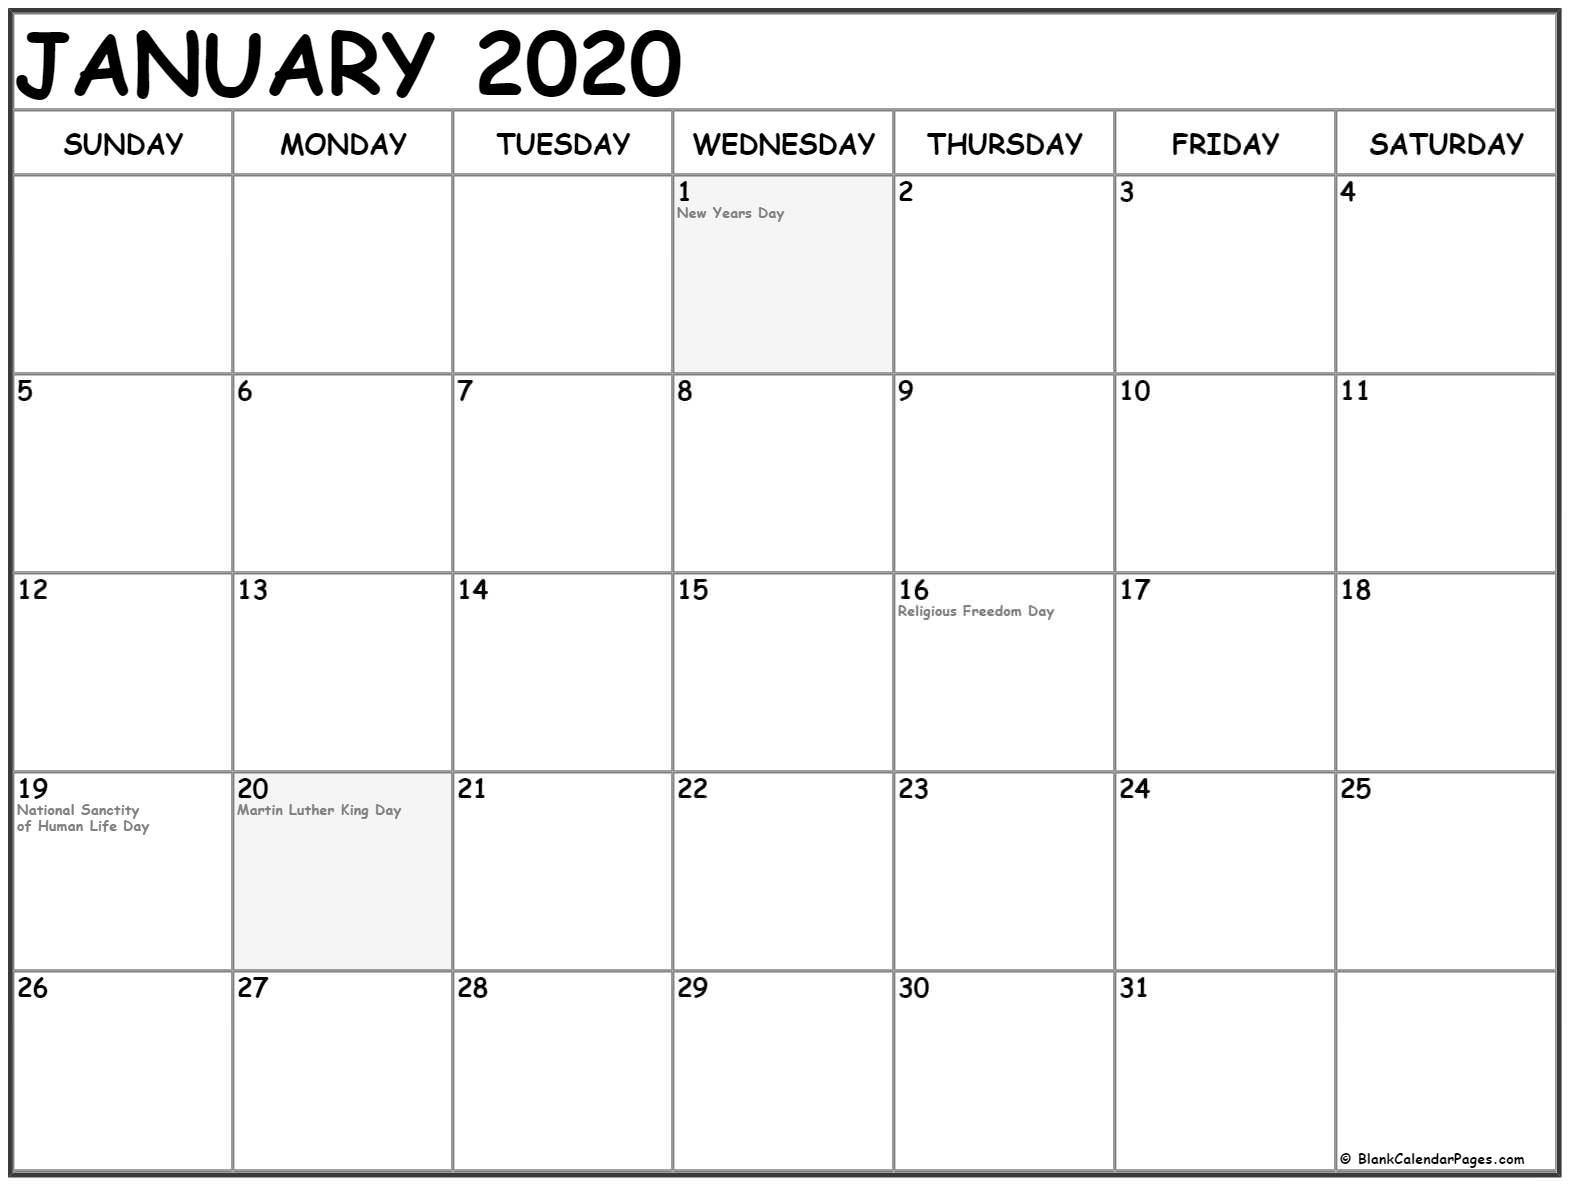 January 2020 Calendar Printable Templates Holidays - July-January 2020 Calendar Canada